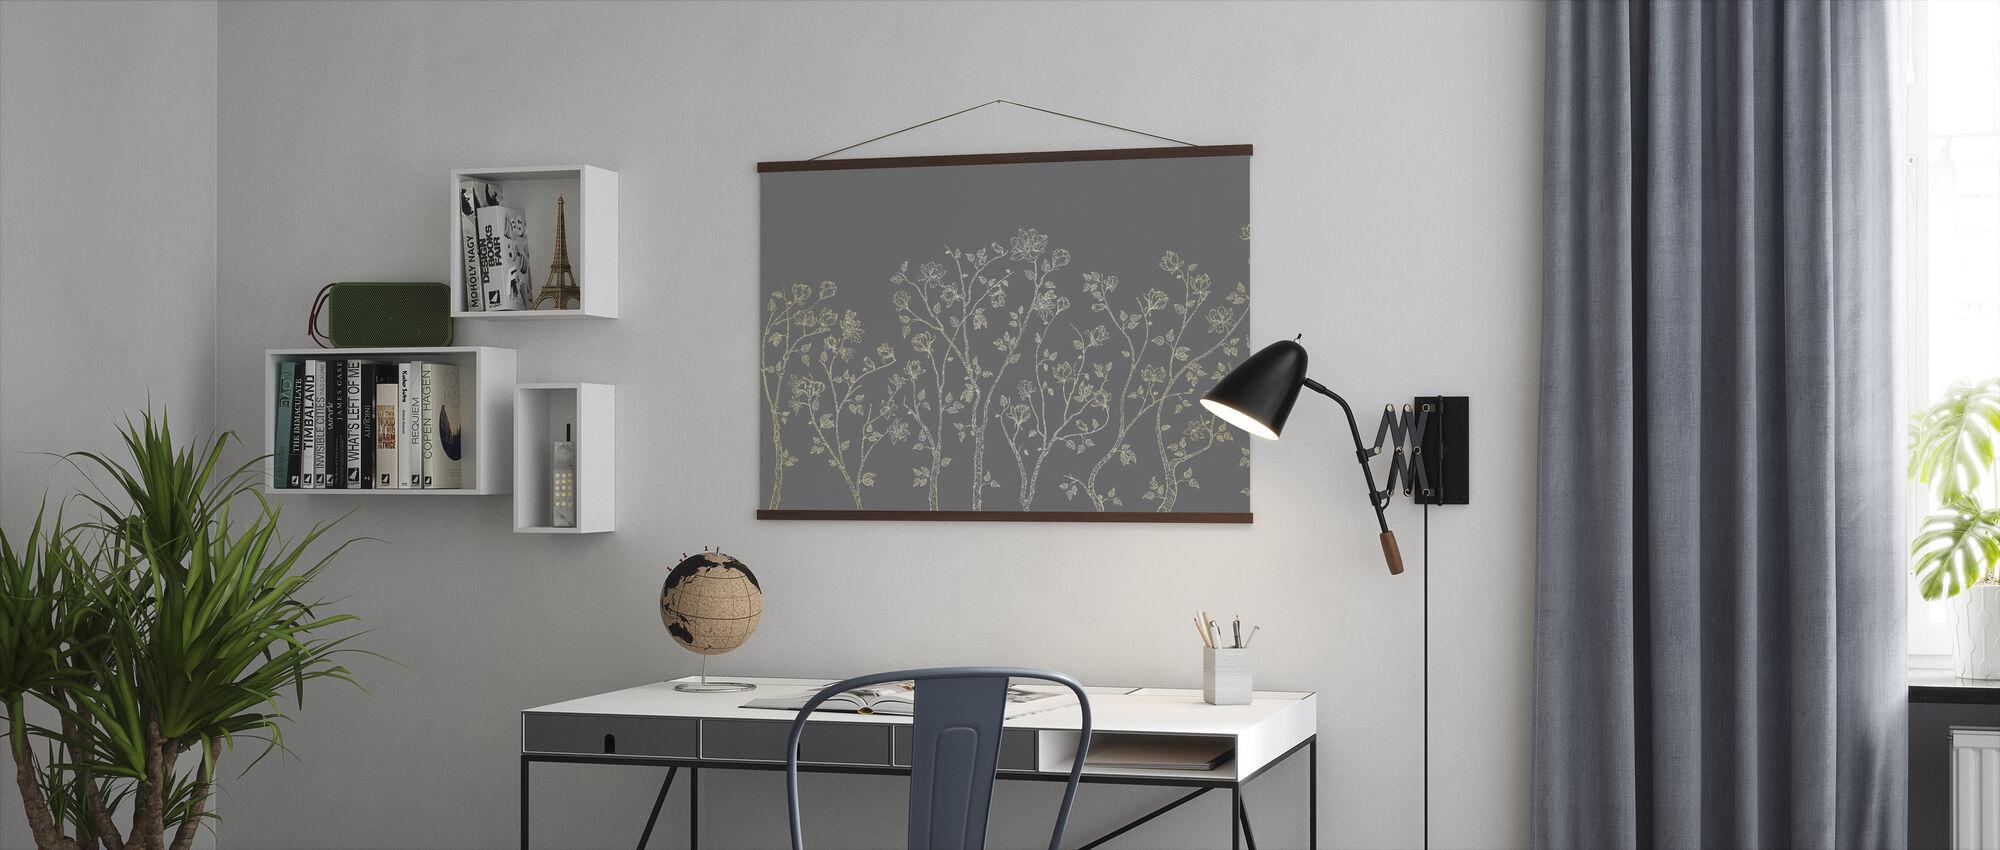 Crescent Vegetative - Grey - Poster - Office